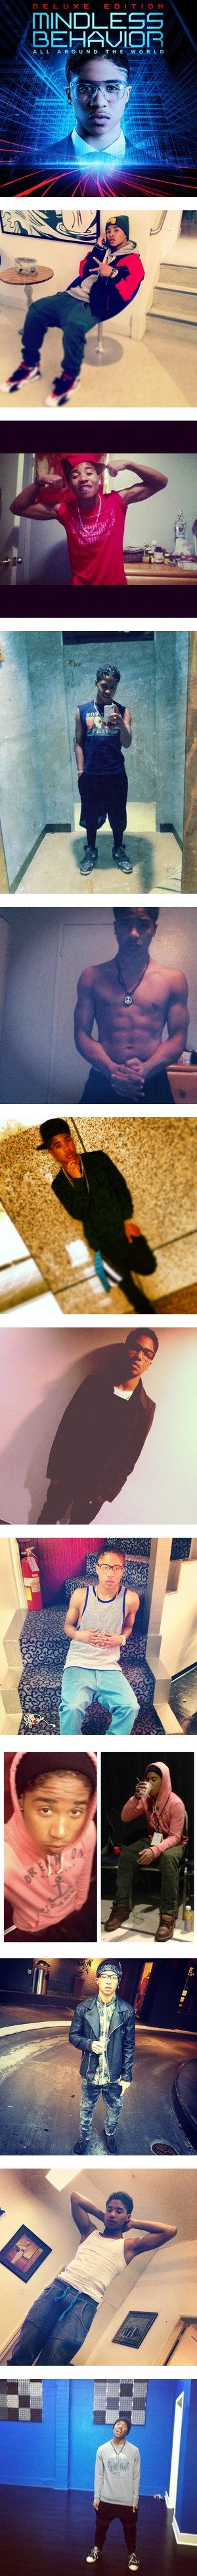 """Roc Royal {1}"" by xxlovablexx ❤ liked on Polyvore"